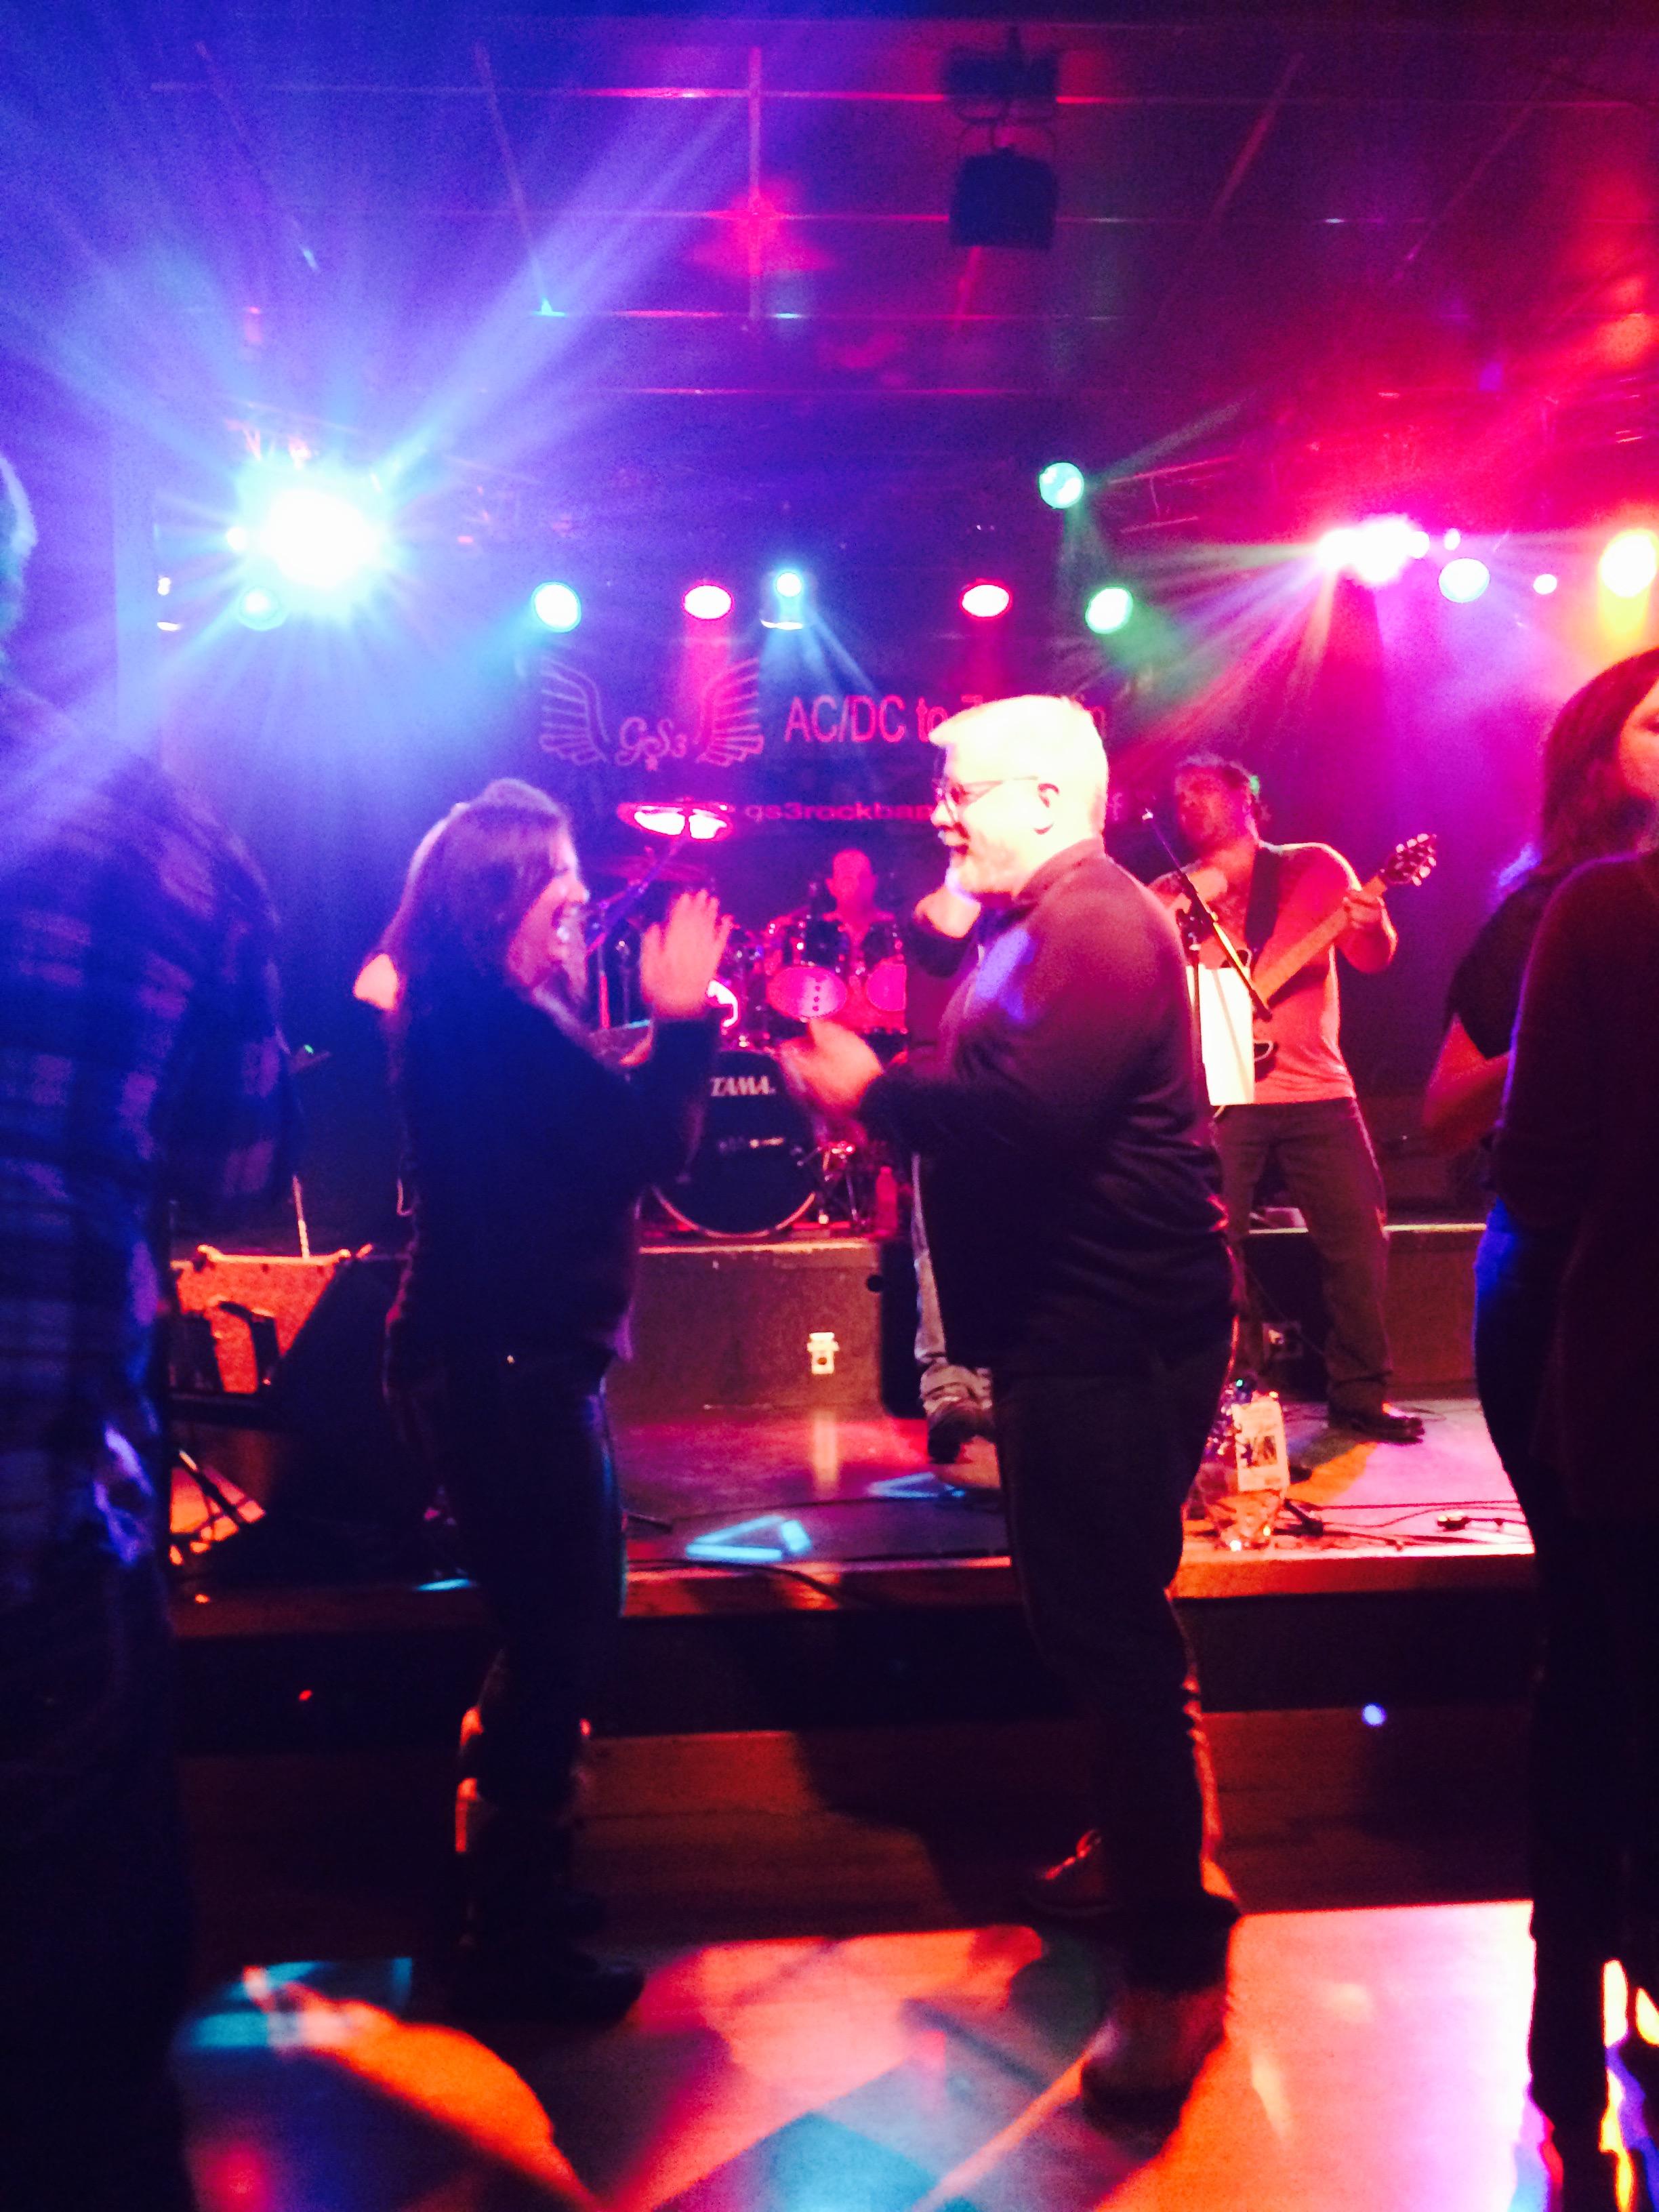 James dancing.jpg